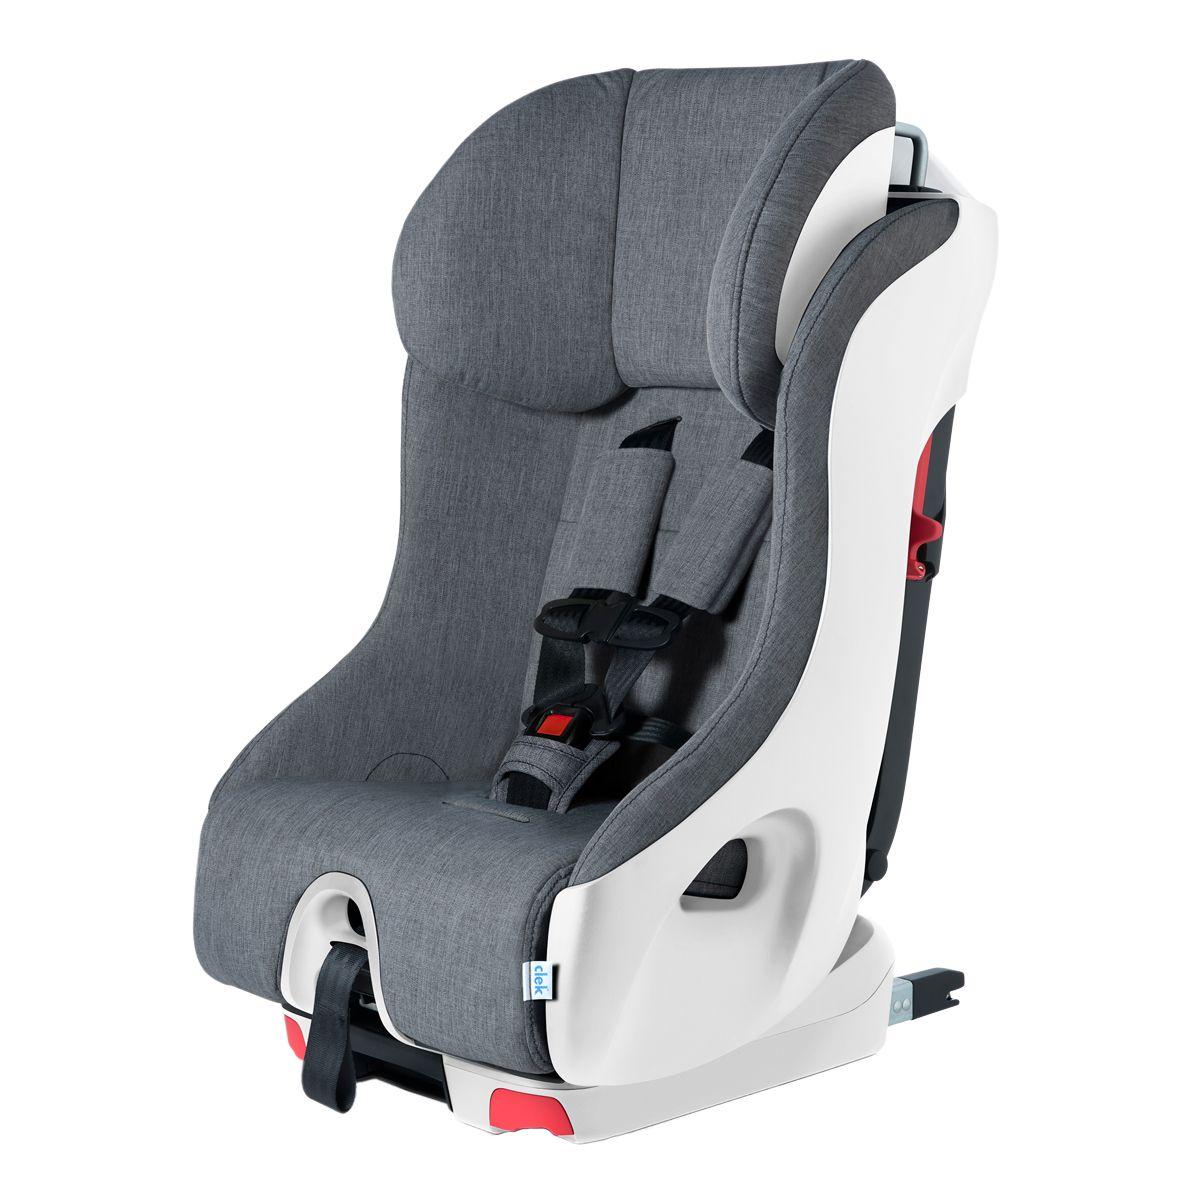 Clek Foonf 2018 Convertible Car Seat Car seats, Baby car